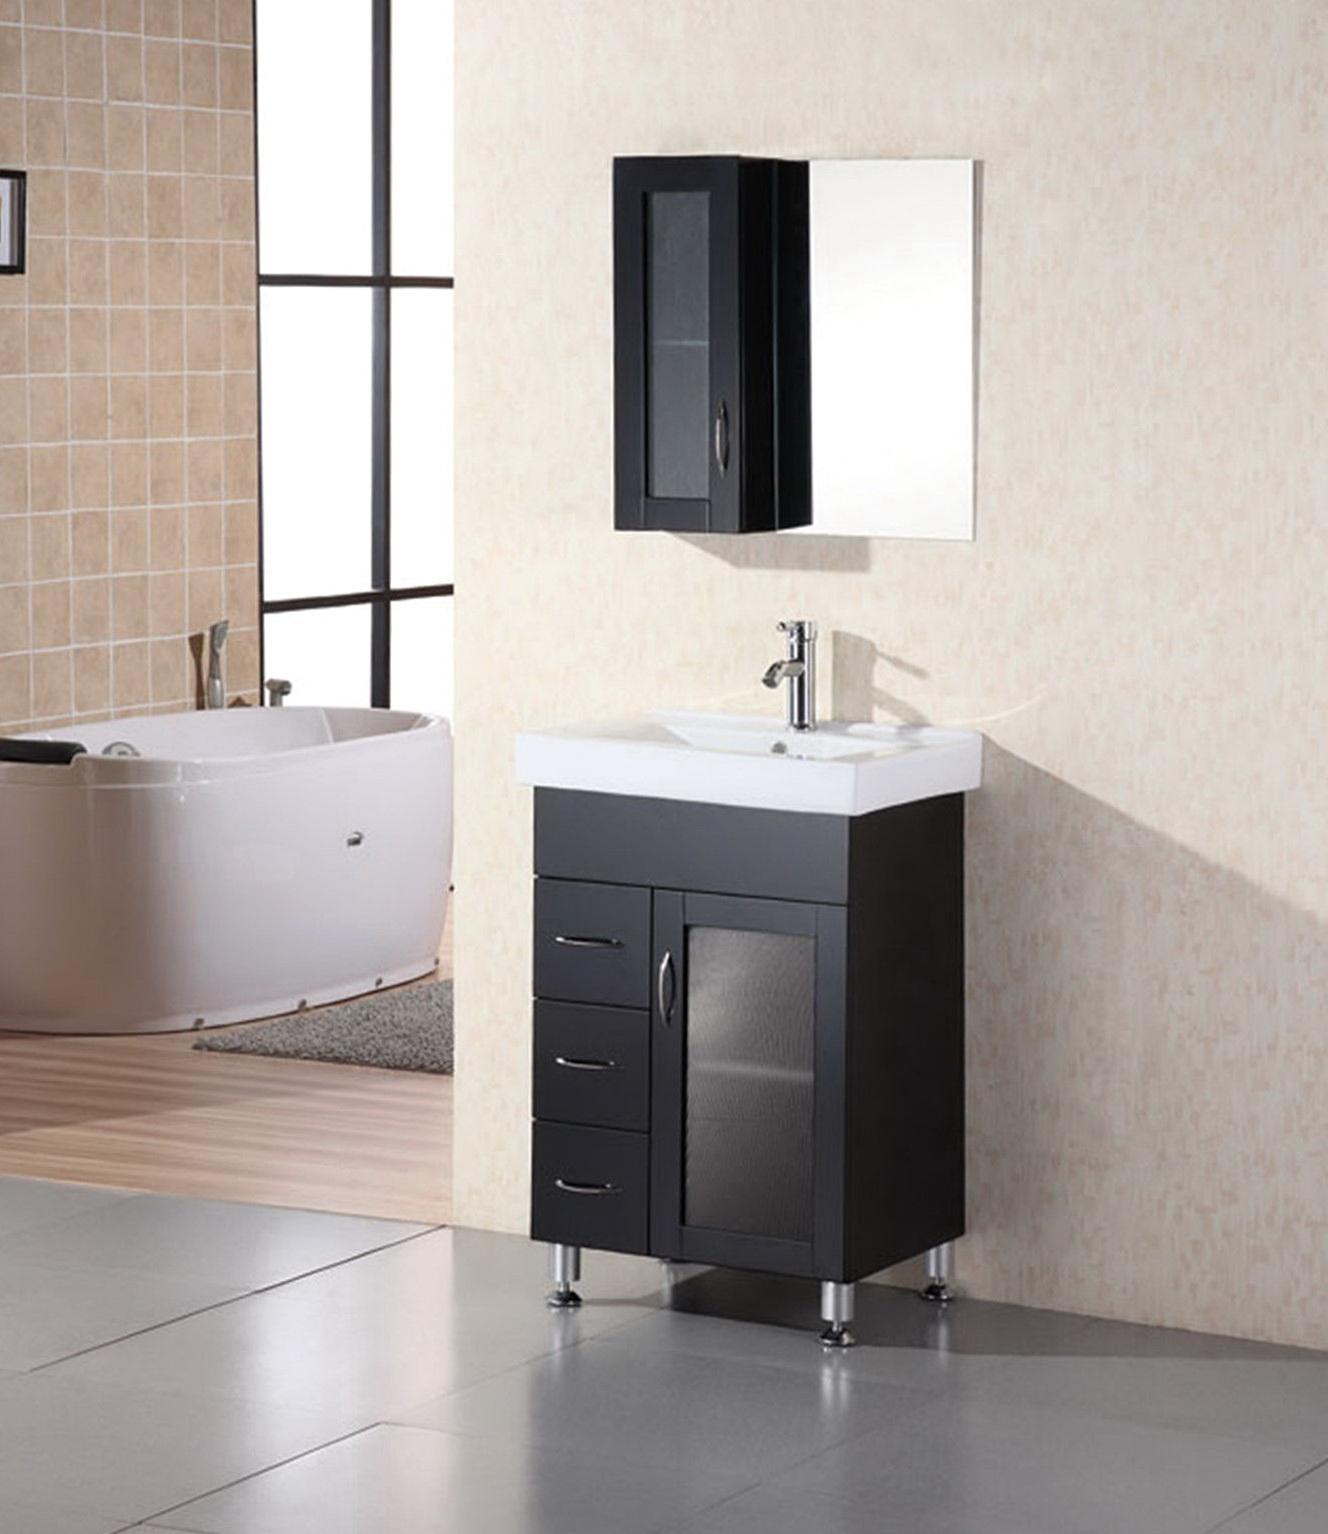 24 Inch Bathroom Vanities With Drawers